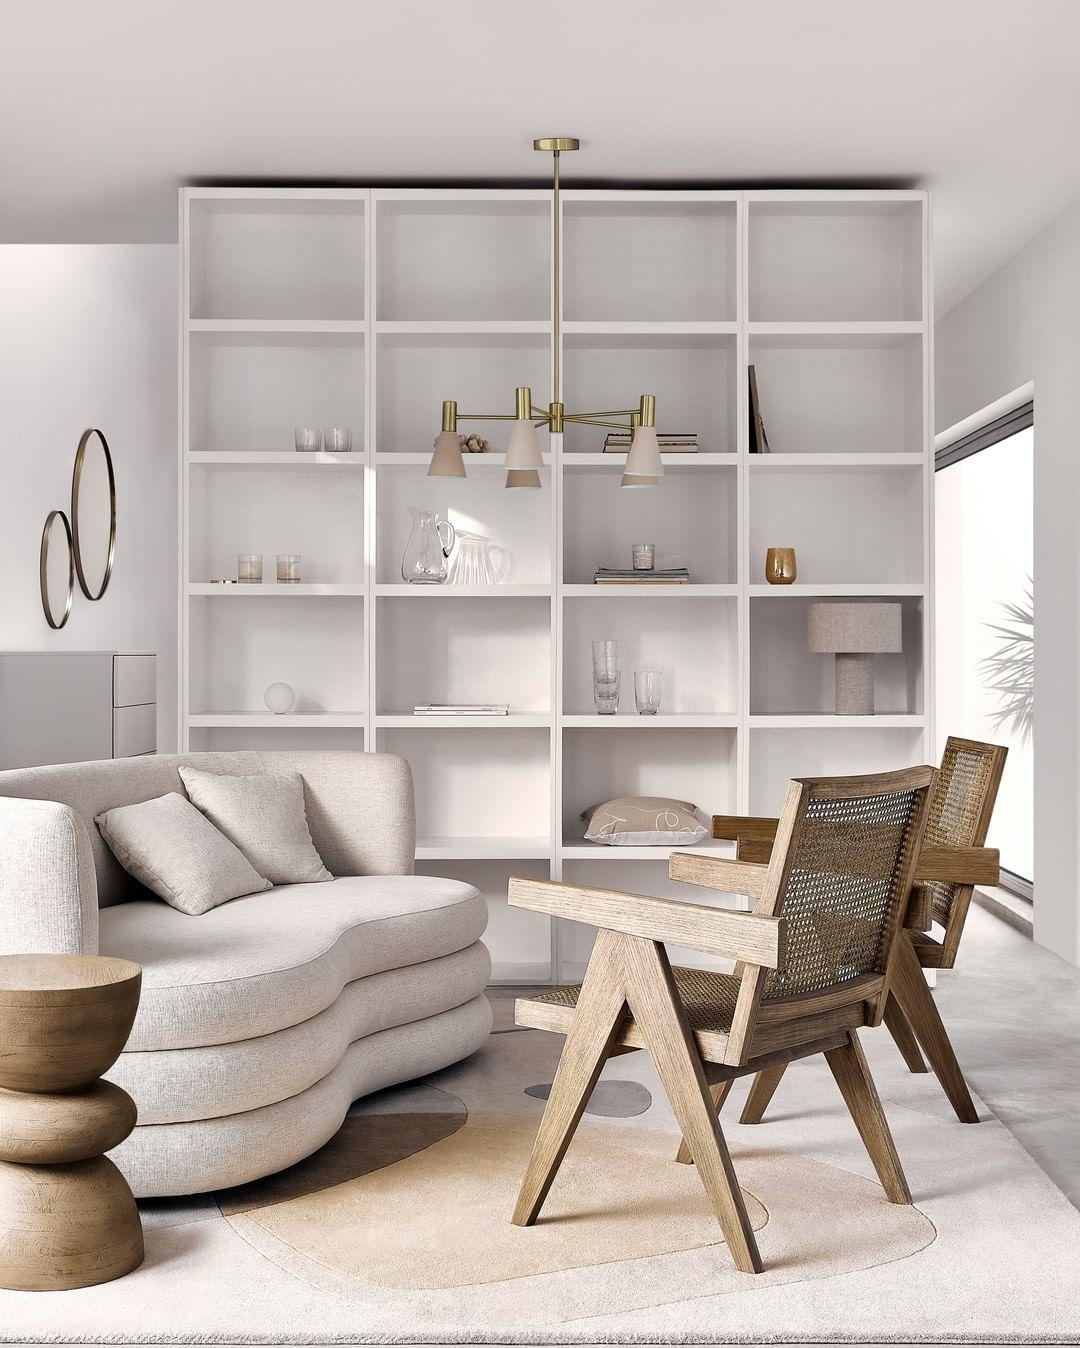 Smallhome Interior Decorating Ideas